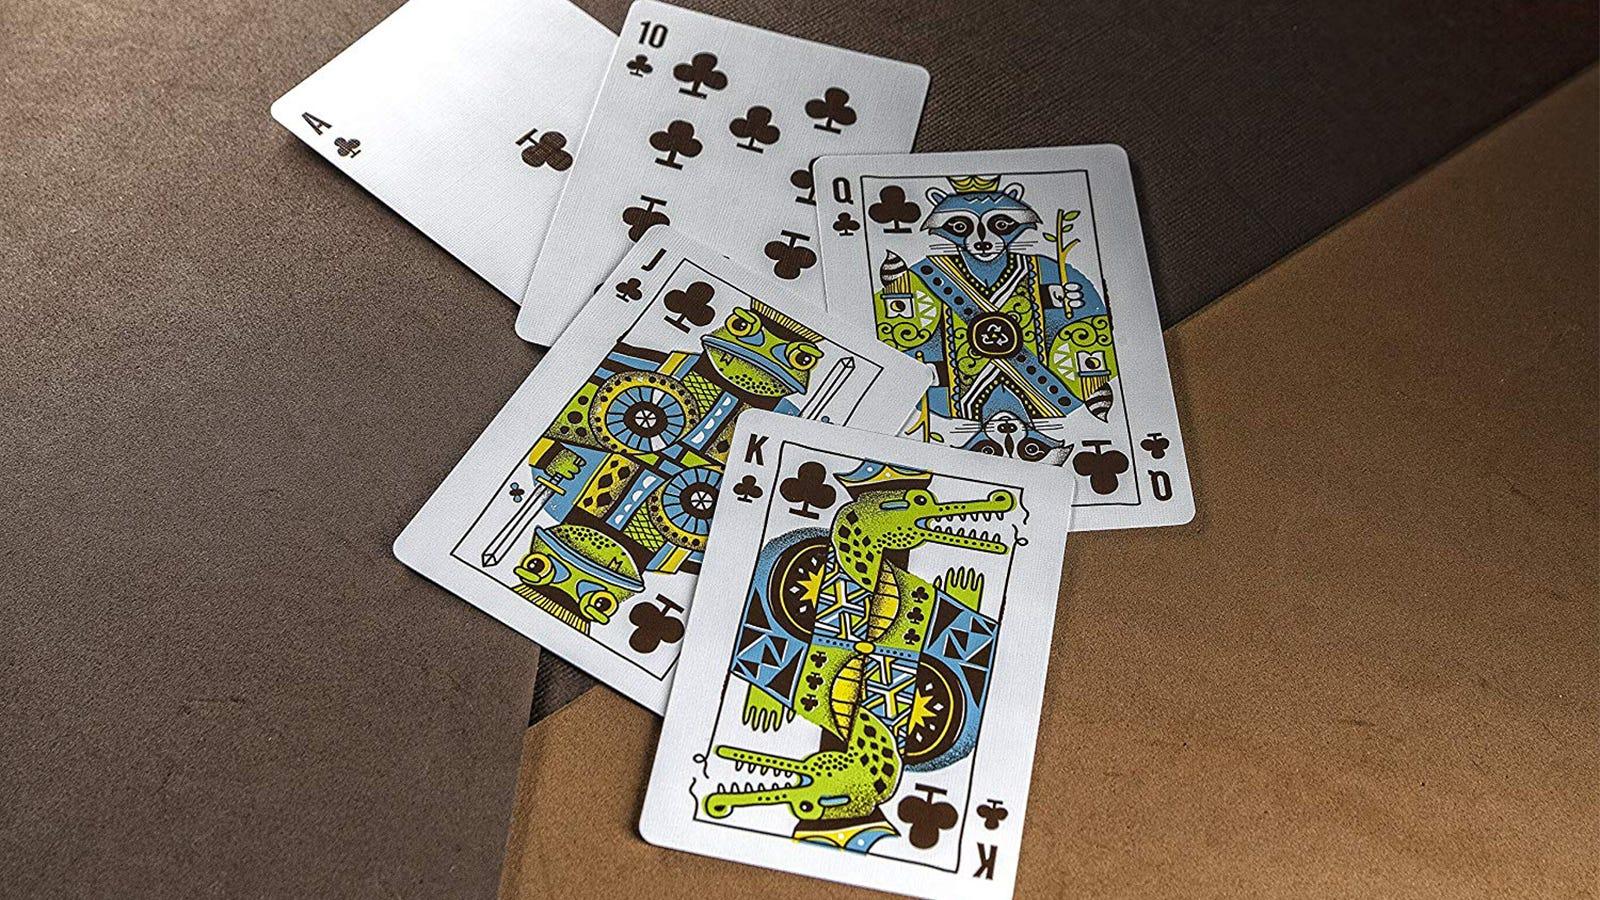 thoery11 Animal Kingdom Playing Cards